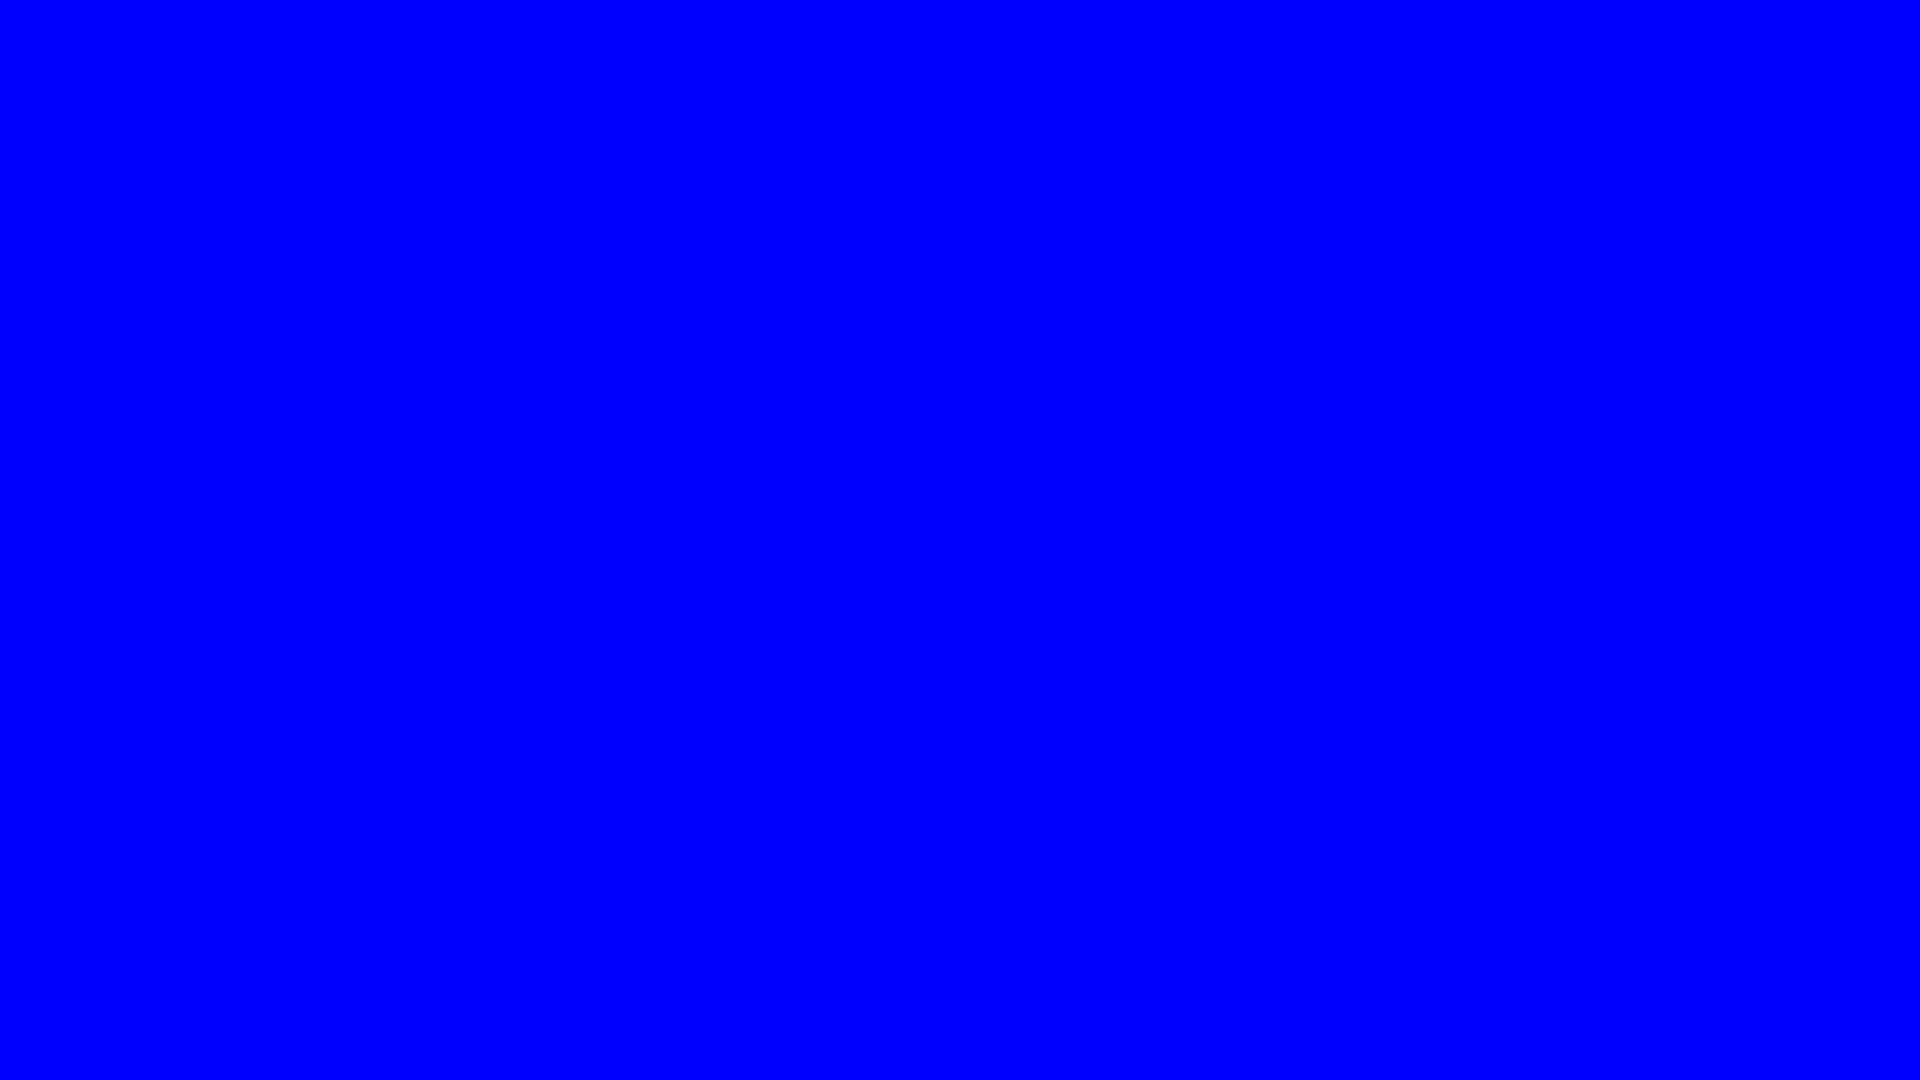 Ten Minutes of Blue Screen in HD 1080P